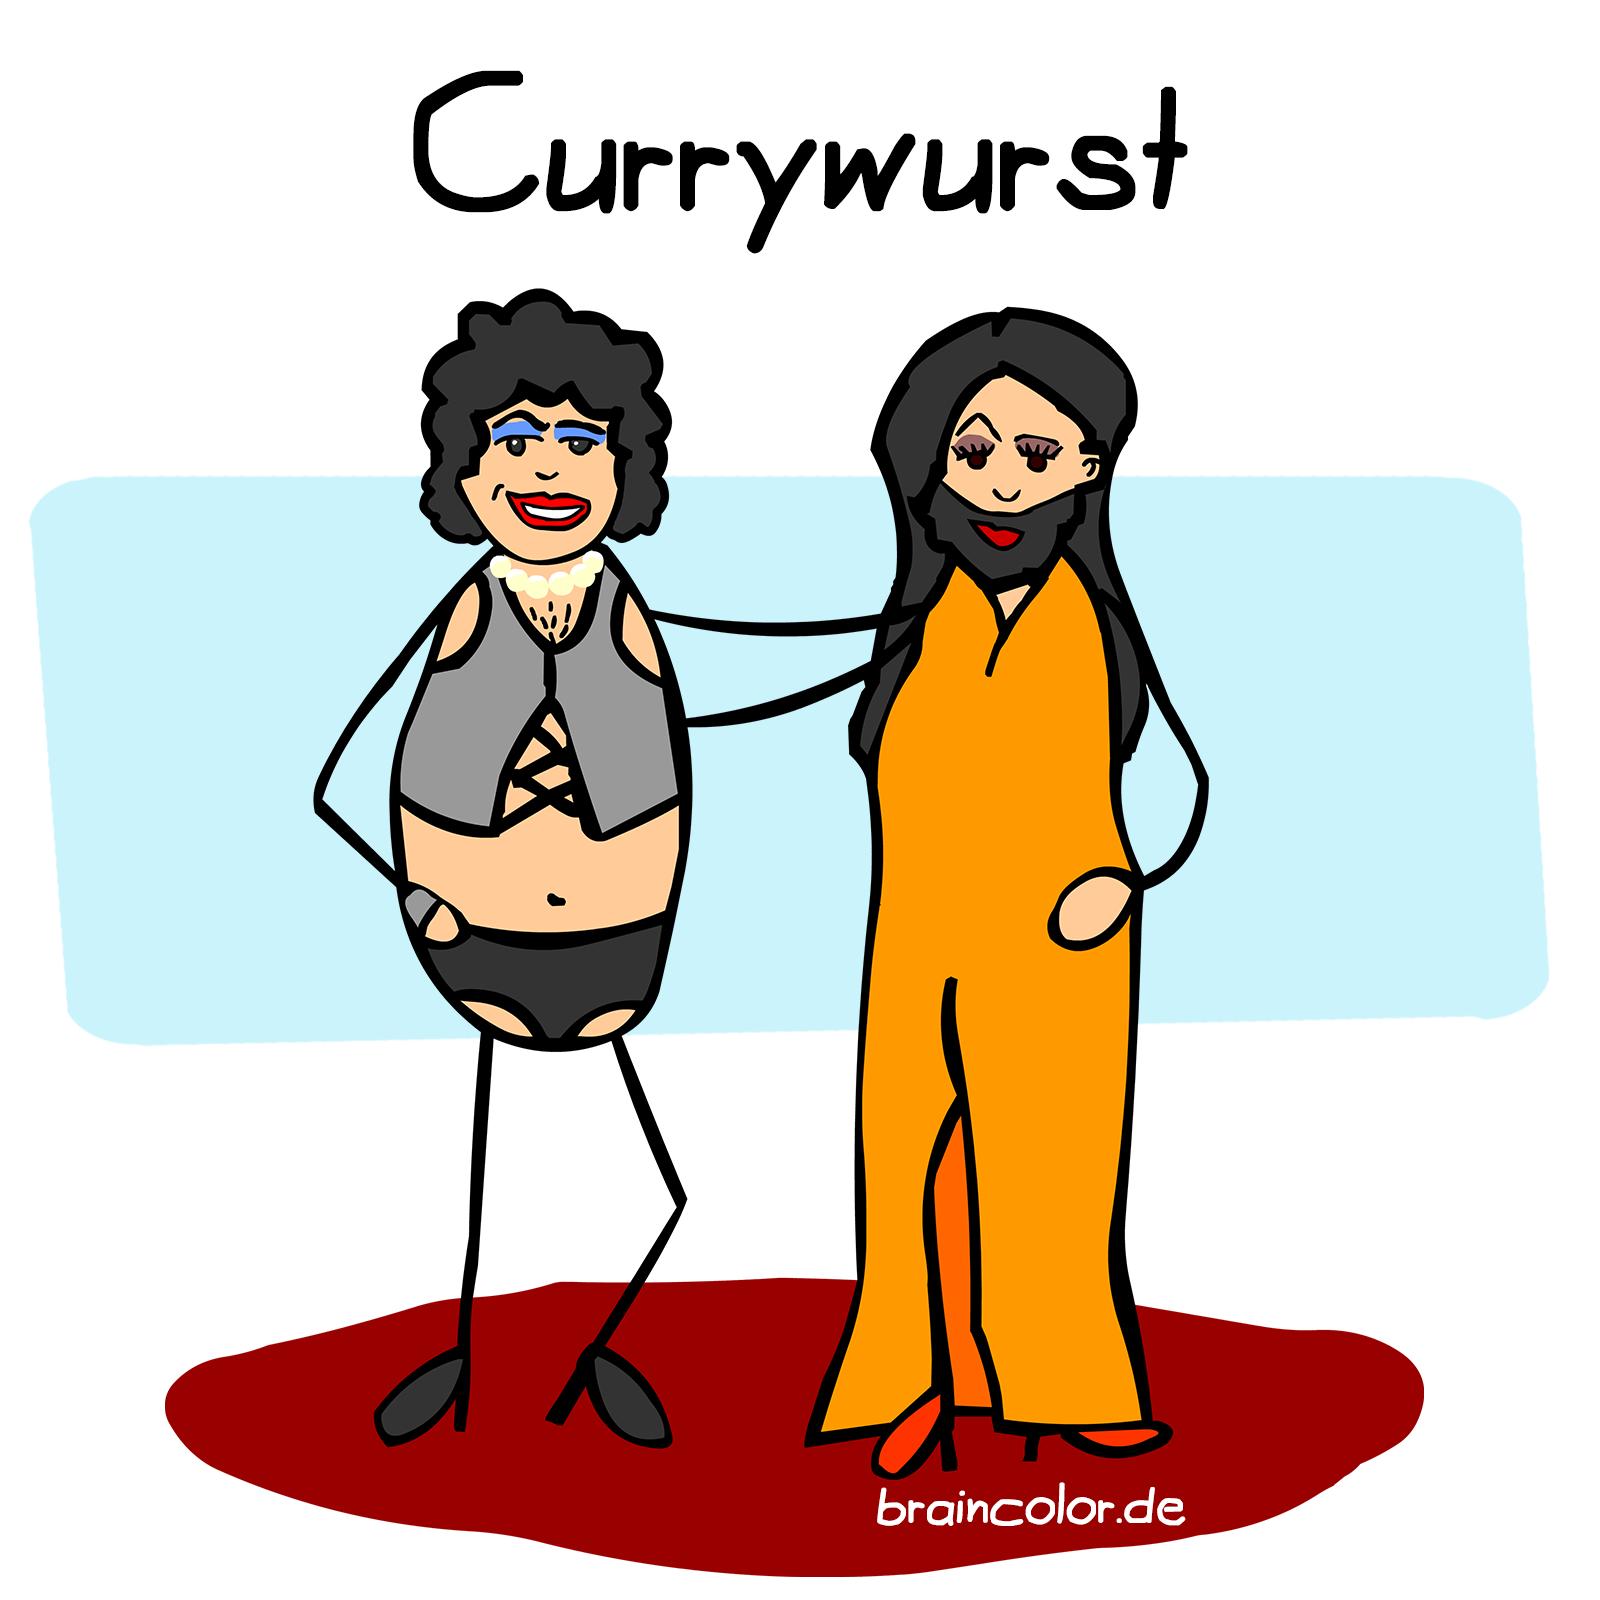 Currywurst Tim Curry Conchita Wurst